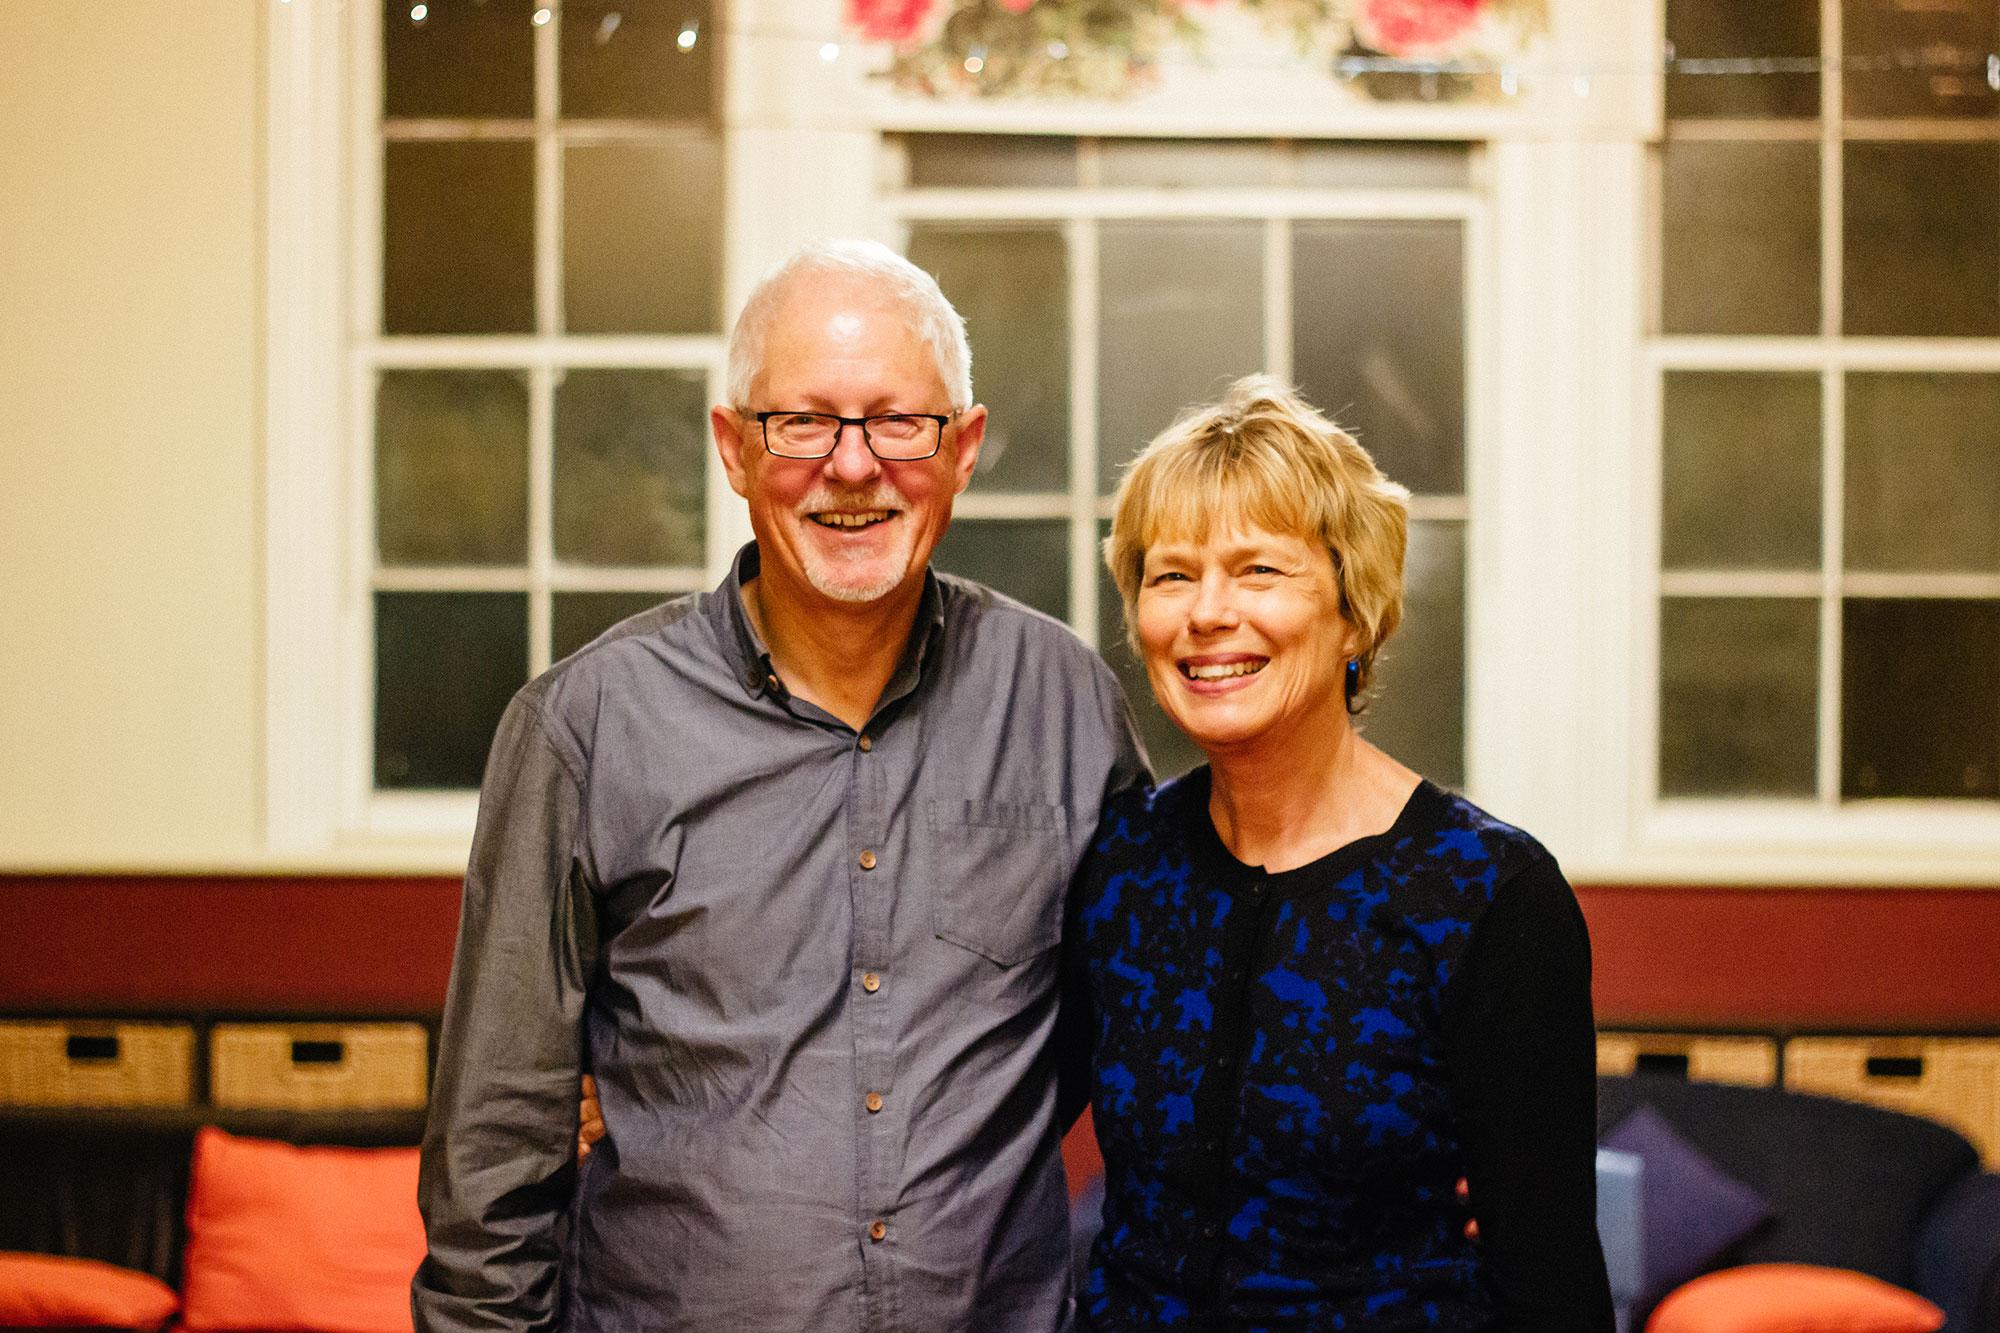 Andrew and Virginia Martin - Pastors and Elders